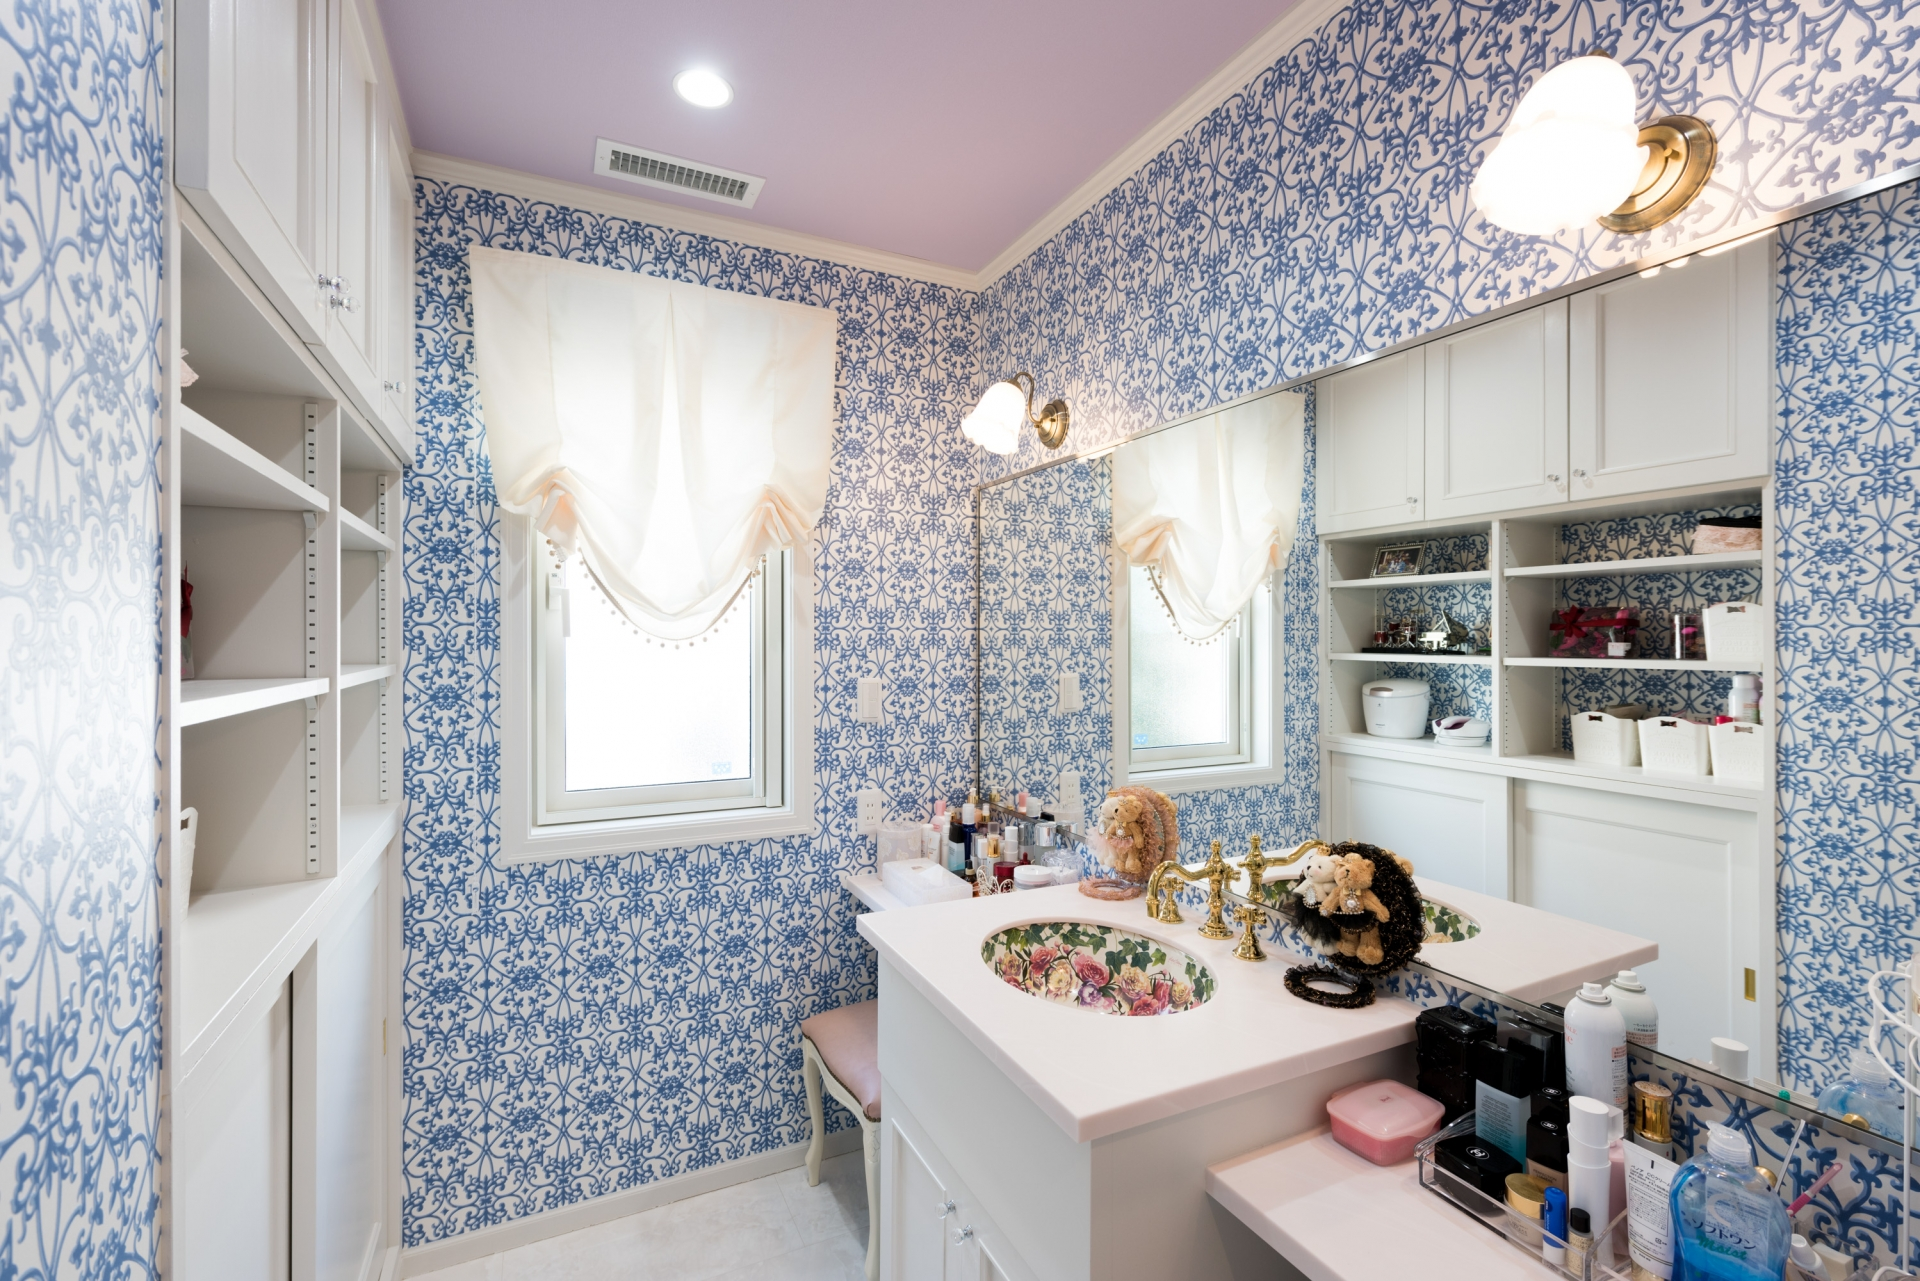 茨城県つくば市T様 不二建設 全館空調 洋風 イタリア家具 洗面化粧室 造作洗面化粧台 鏡 造作家具